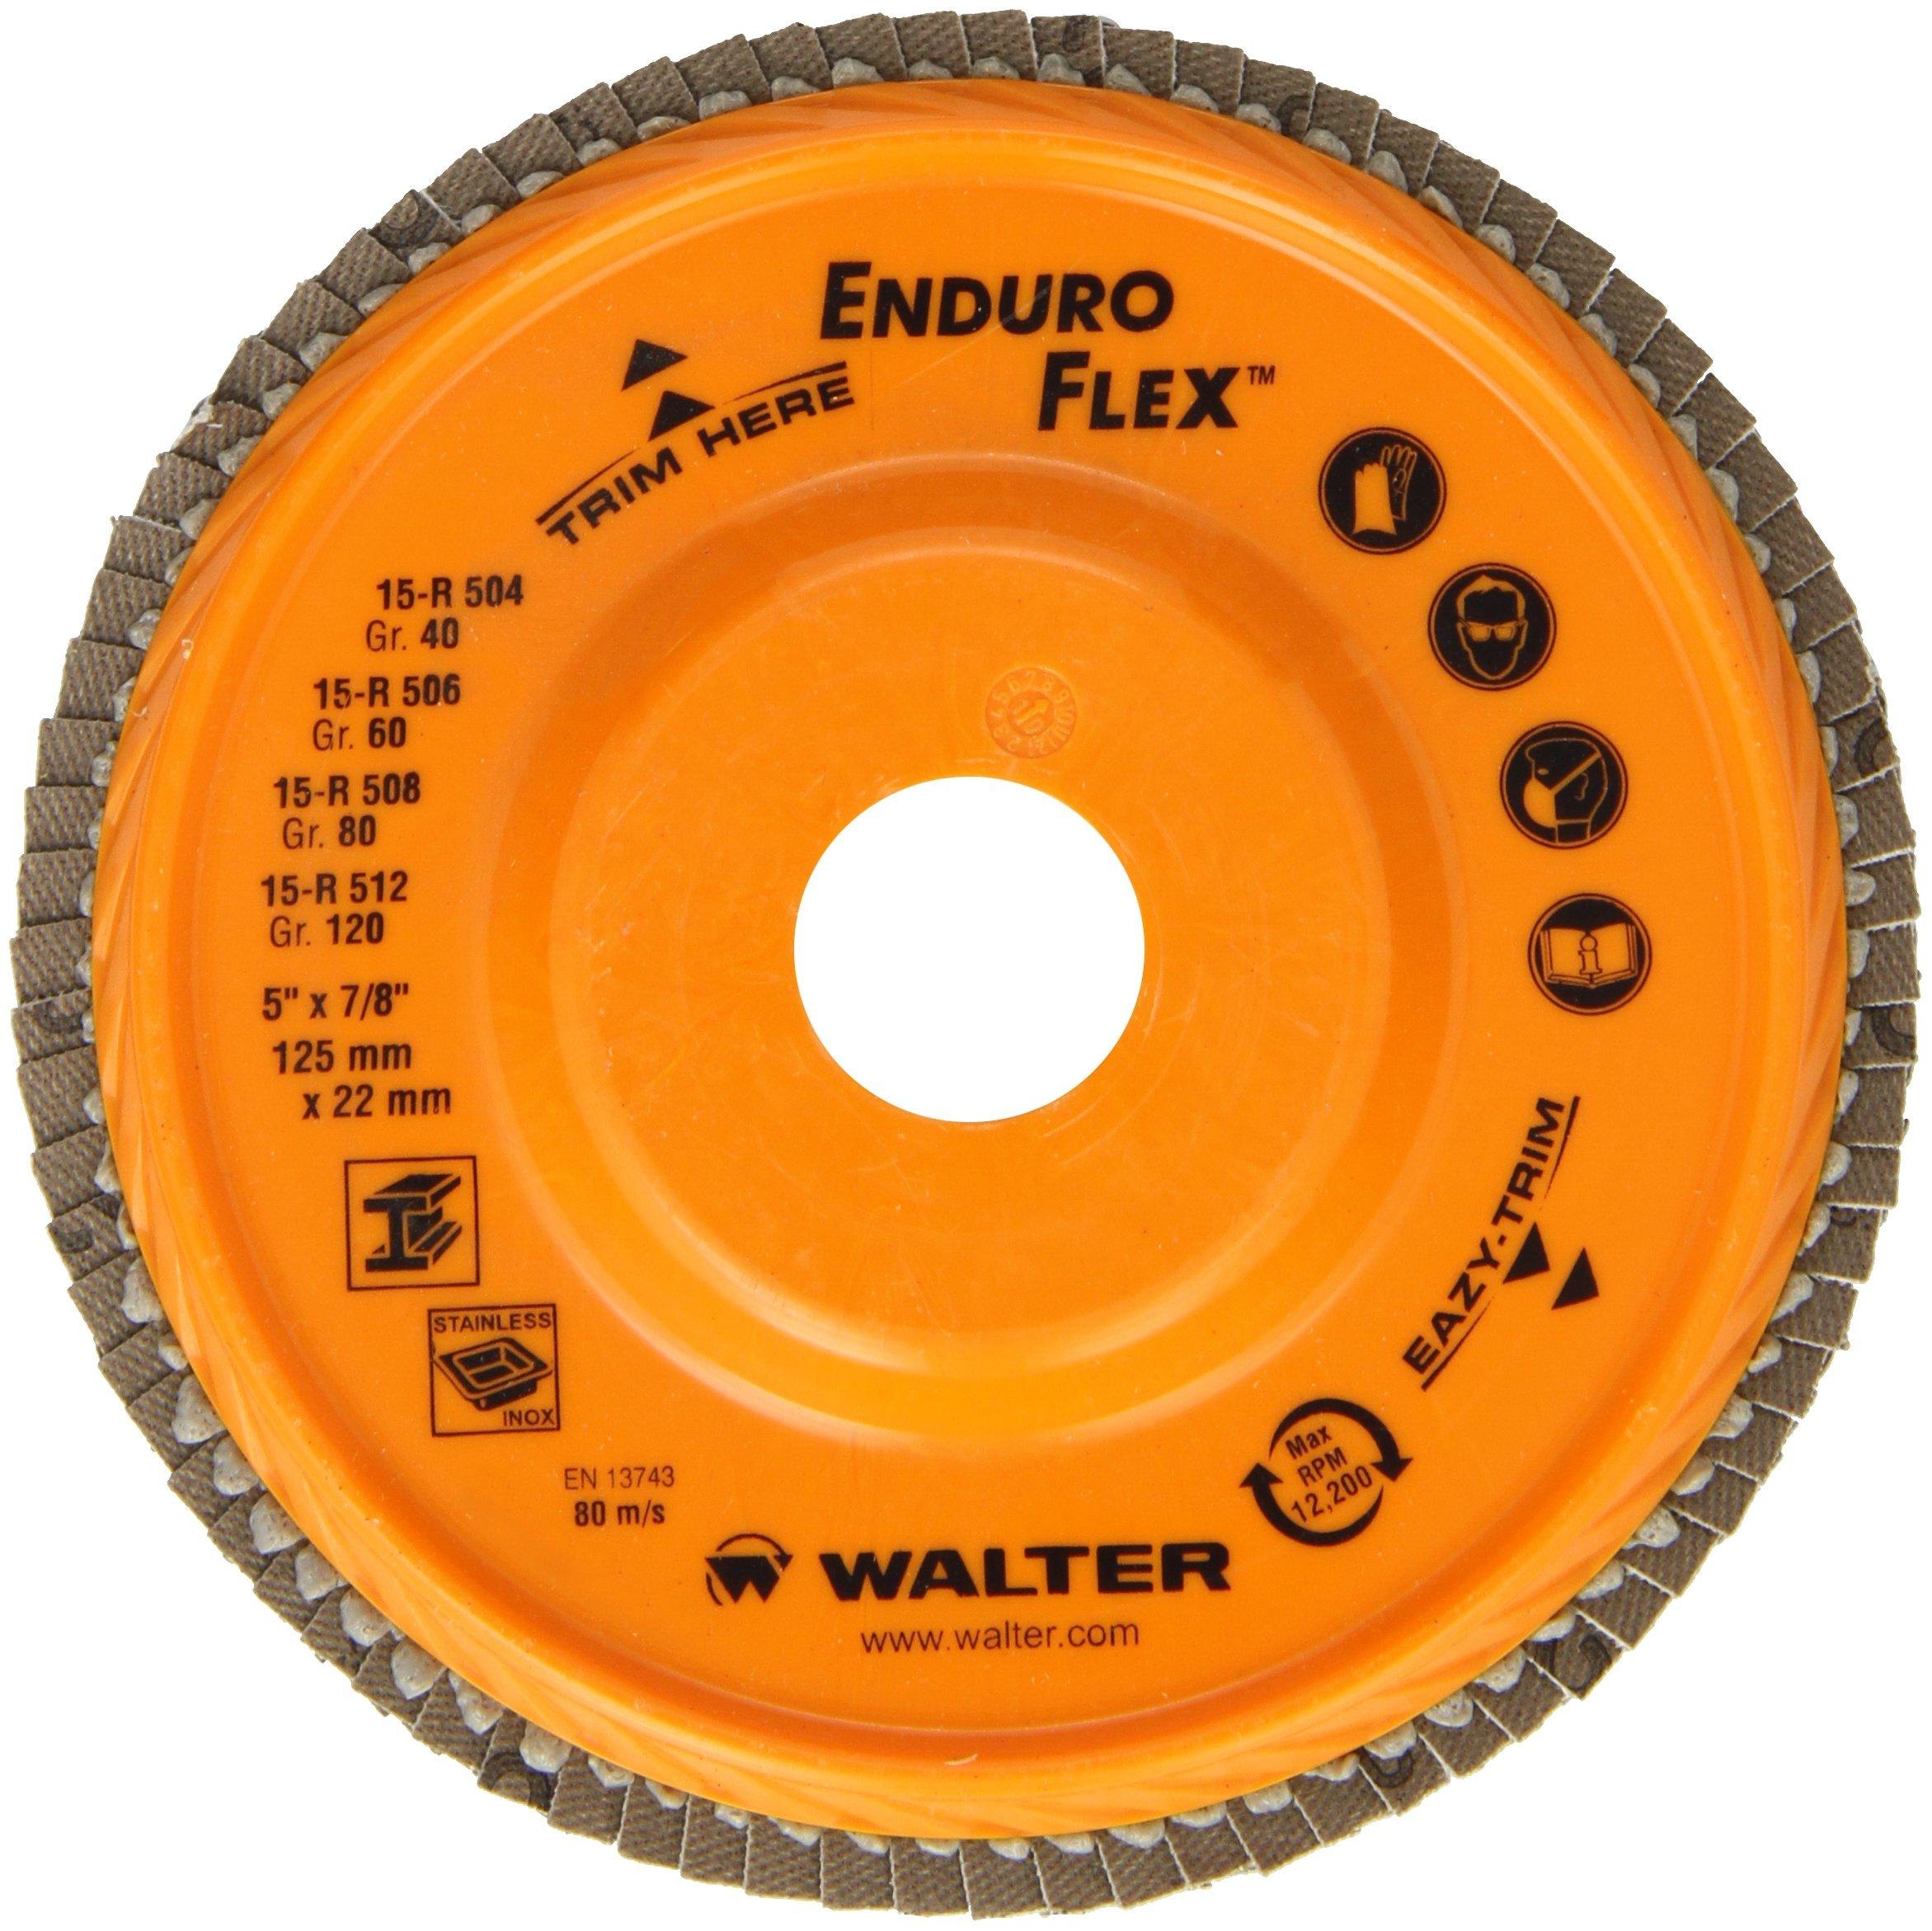 Walter Enduro-Flex Abrasive Flap Disc, Type 29, 5/8''-11 Thread Size, Trimmable wood fiber Backing, Zirconia Alumina (Pack of 10)